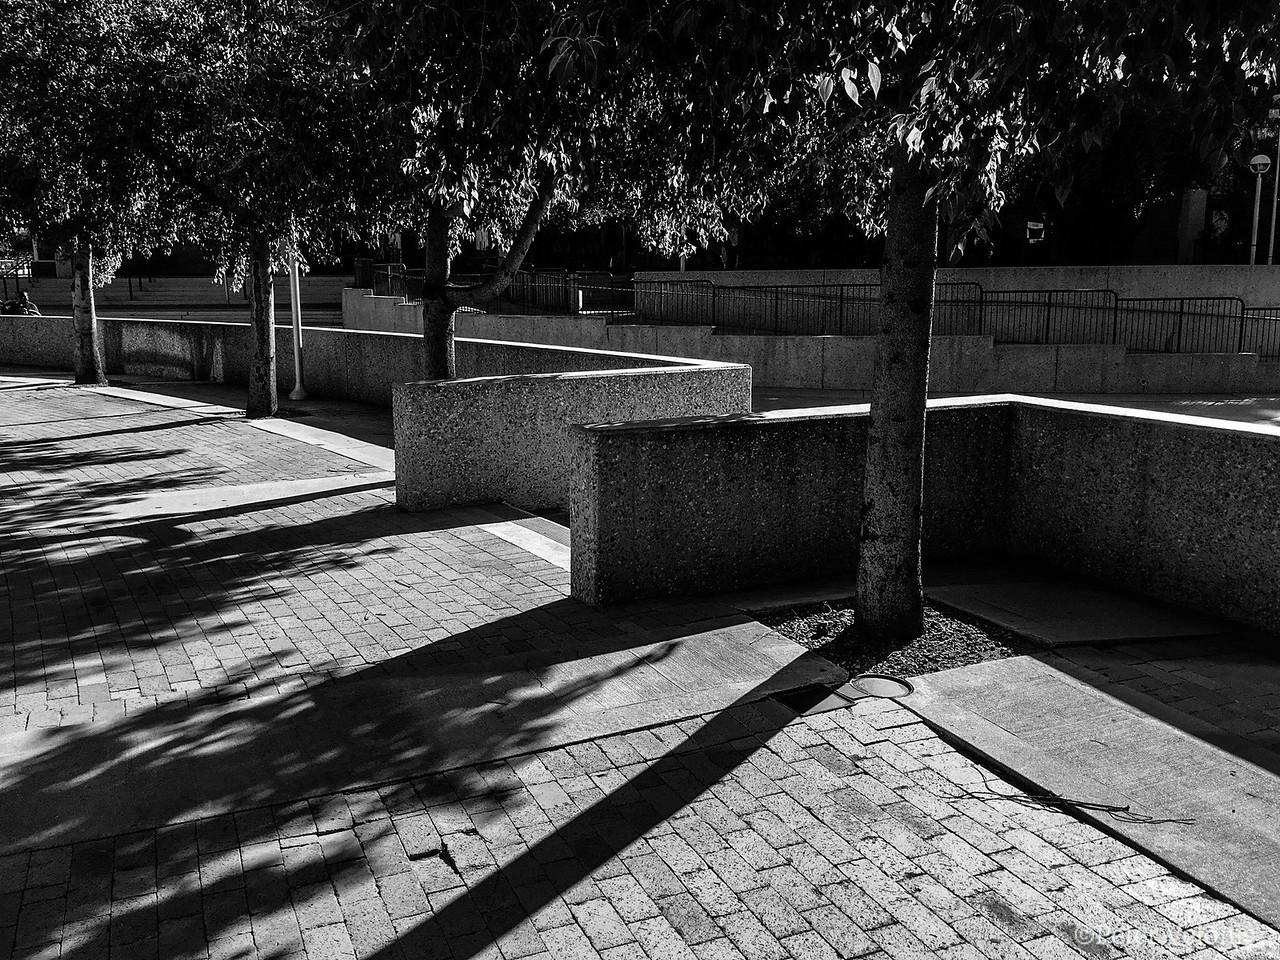 Walkway and wall